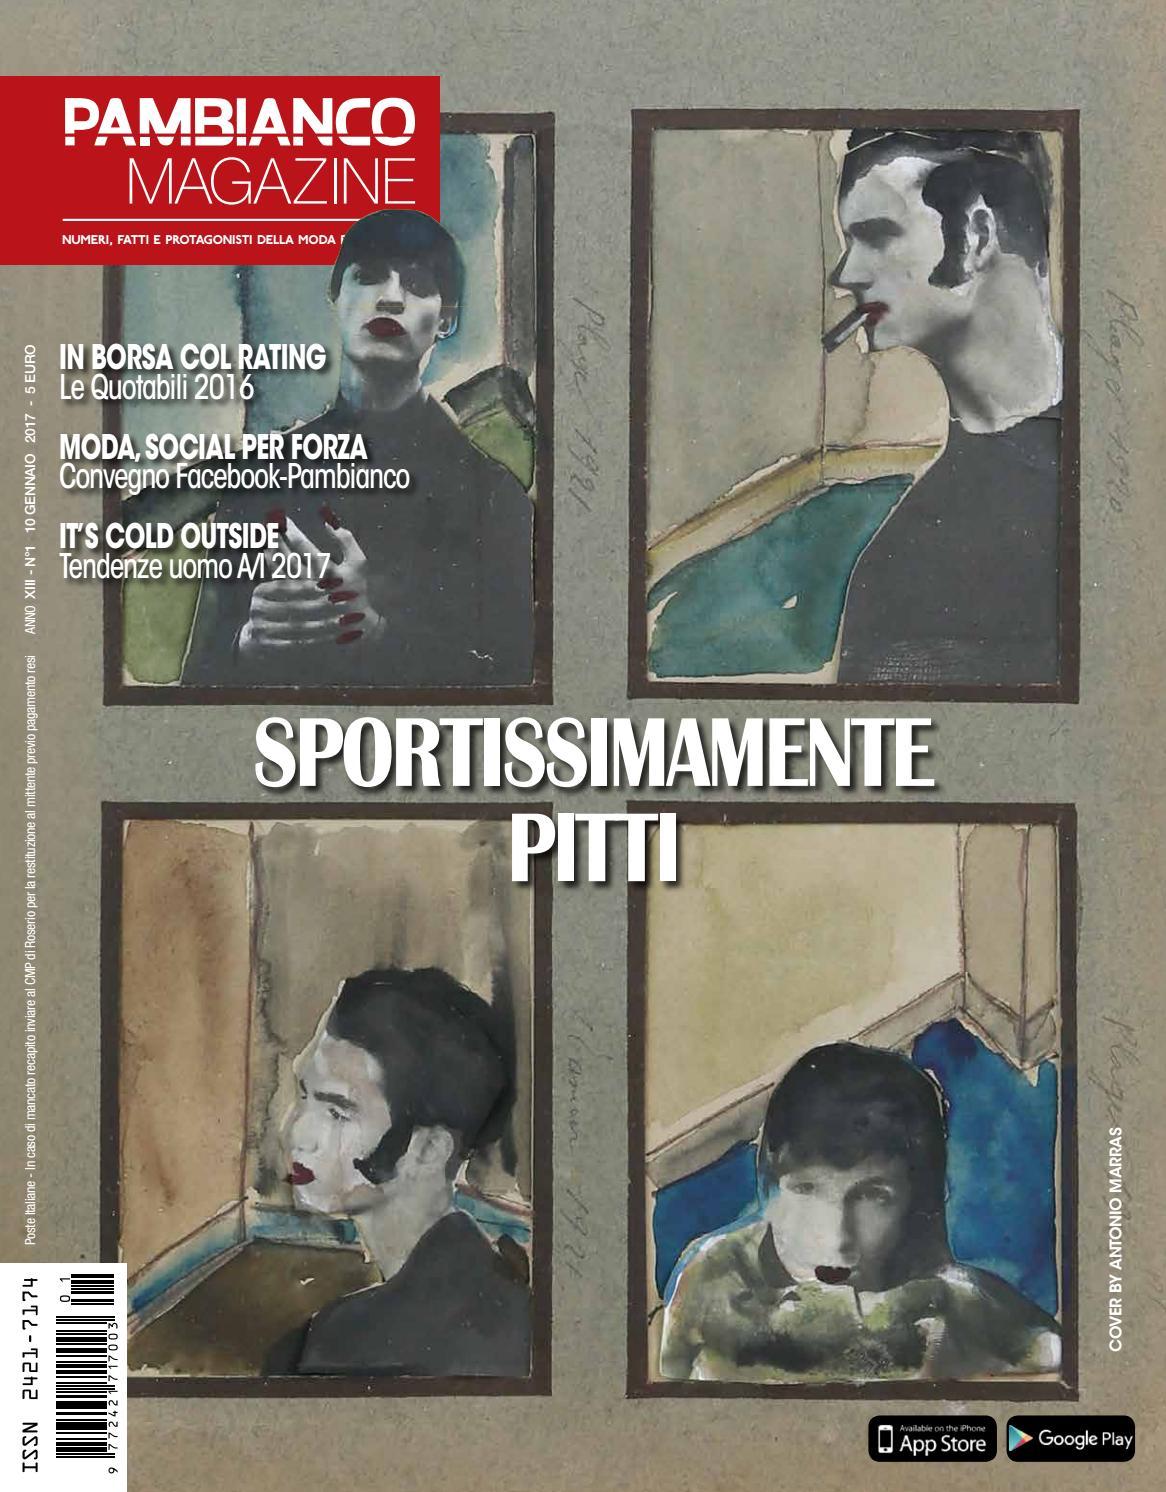 Pambianco magazine N 1 XIII by Pambianconews issuu